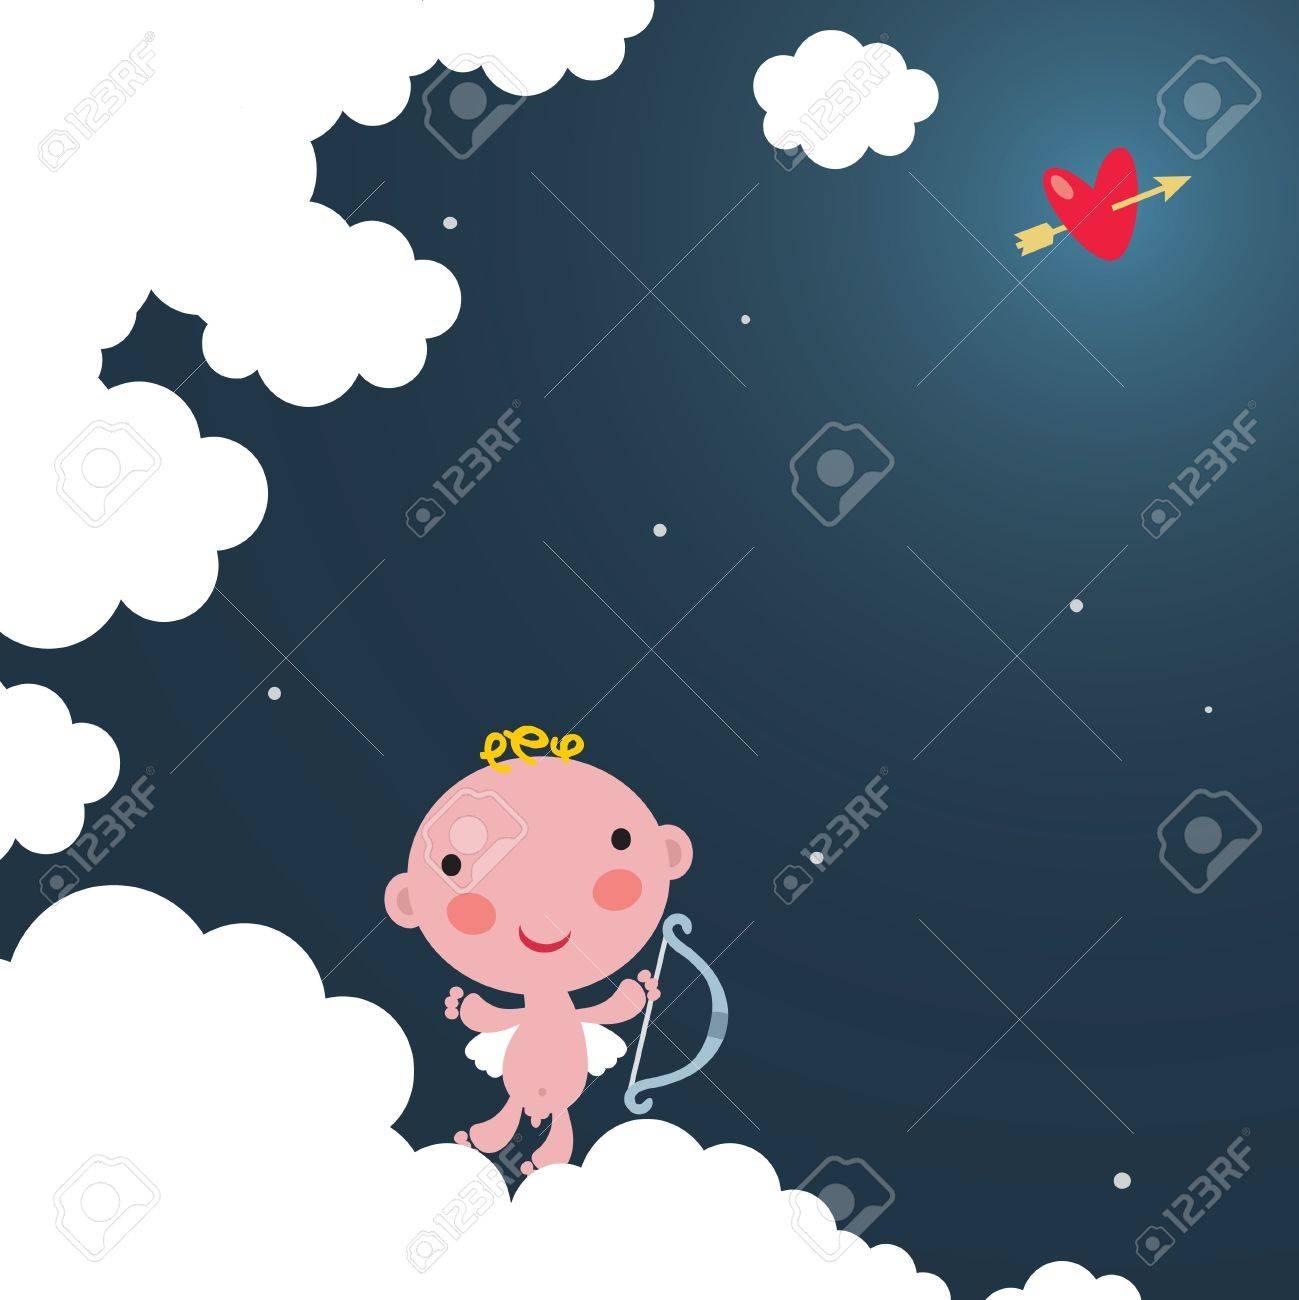 Cute cupid on the cloud. Stock Vector - 12072195